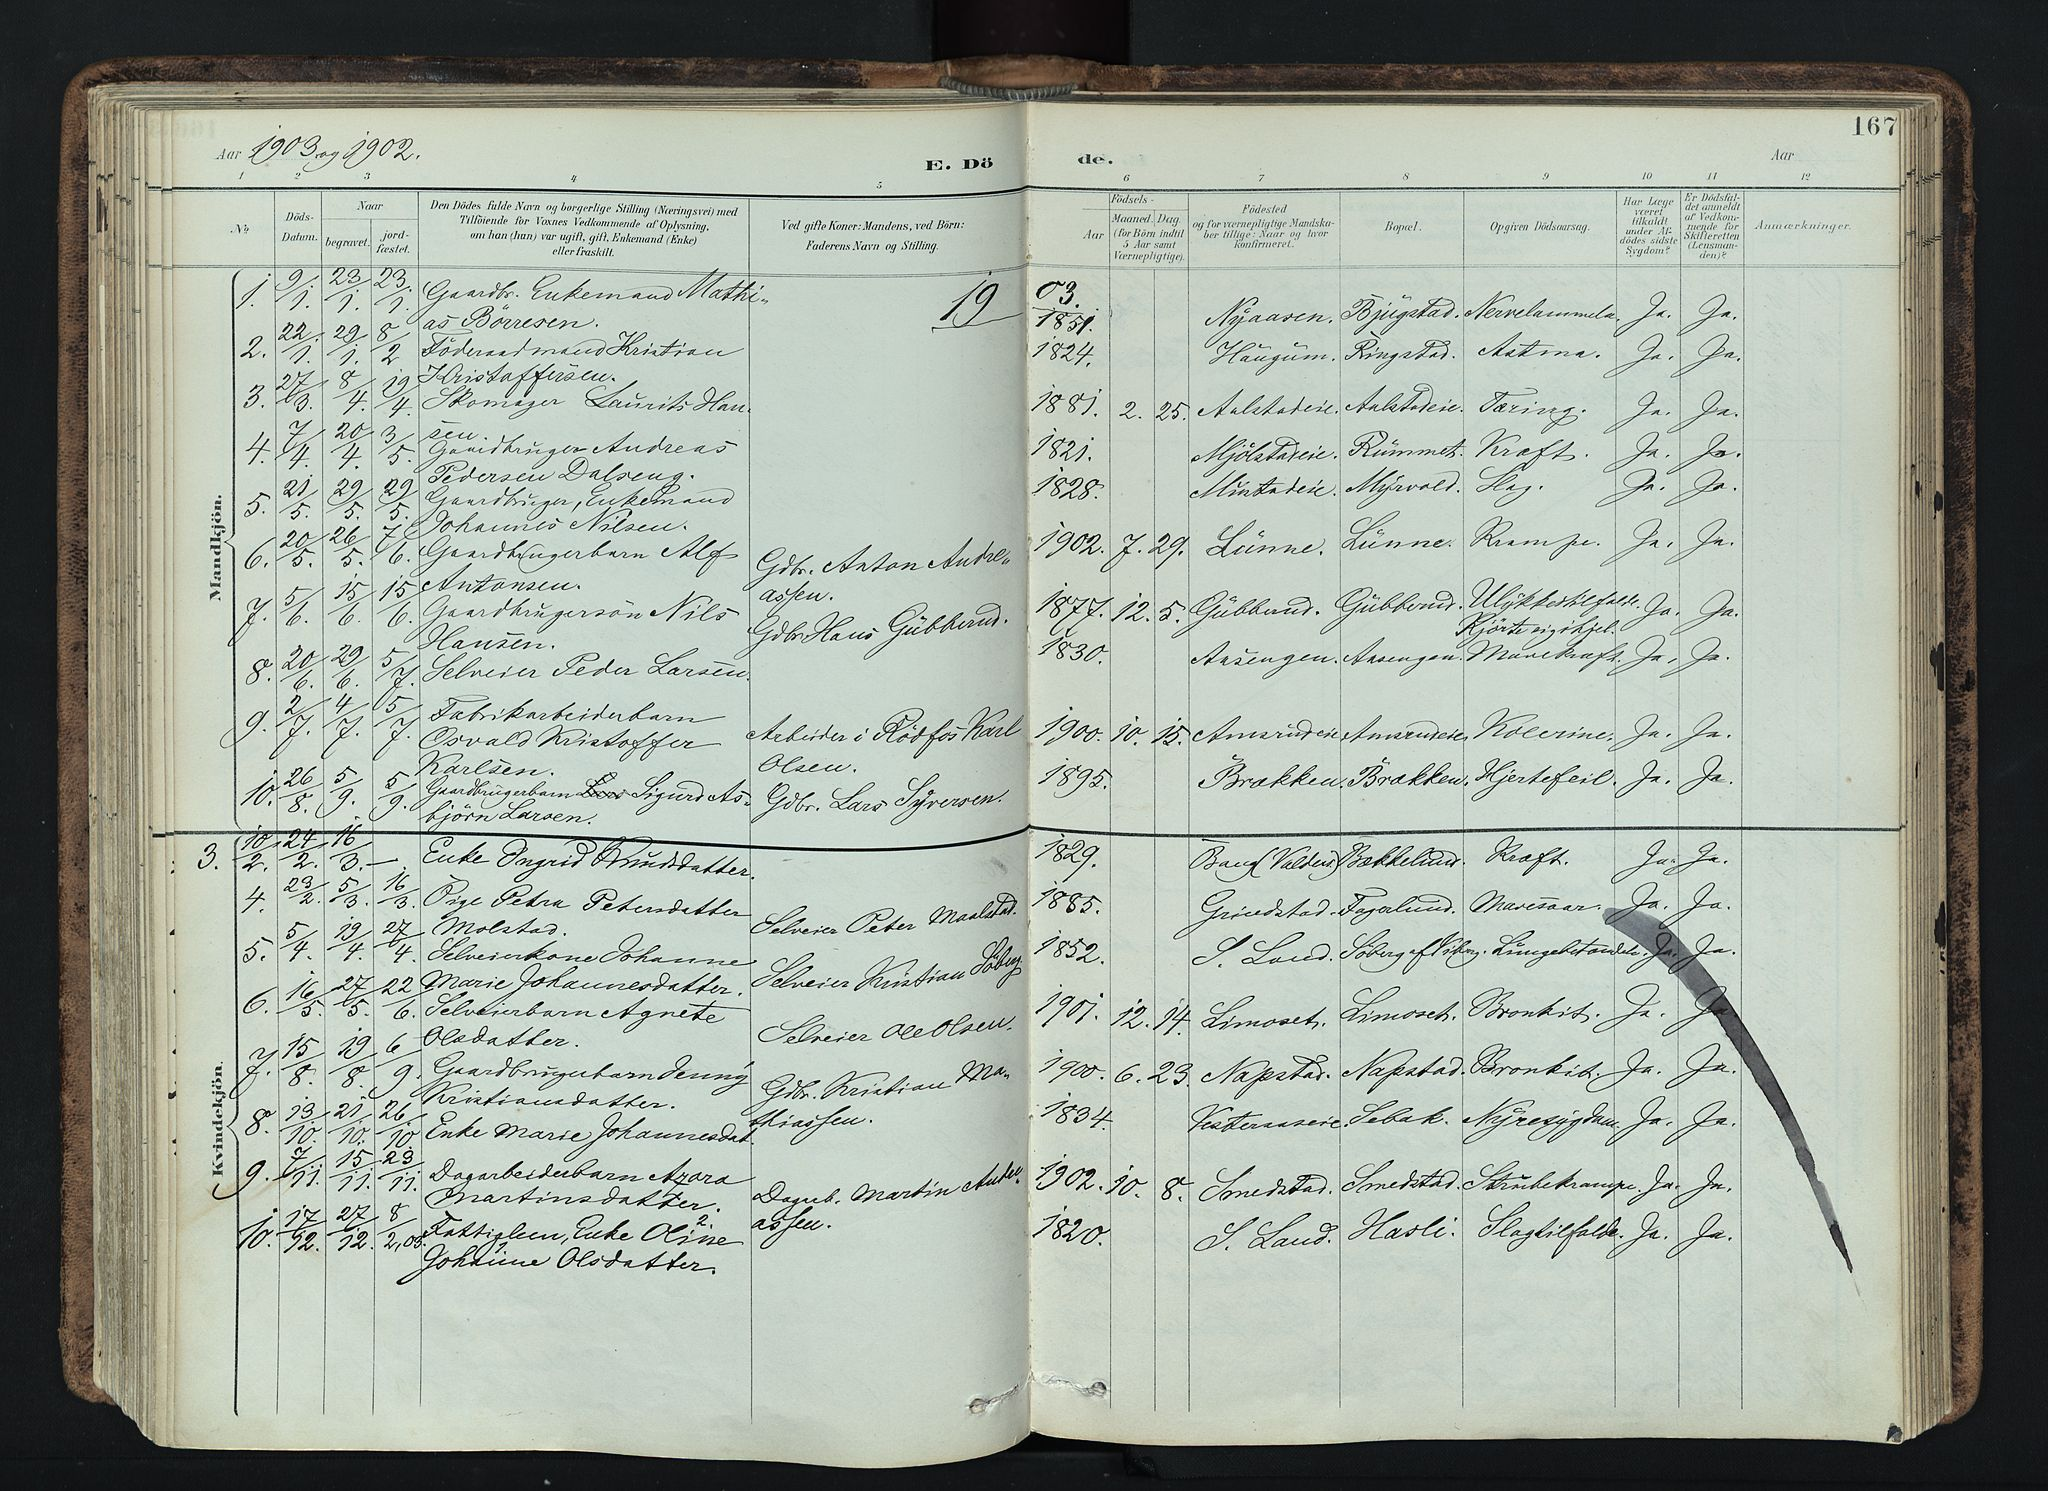 SAH, Vardal prestekontor, H/Ha/Haa/L0019: Ministerialbok nr. 19, 1893-1907, s. 167